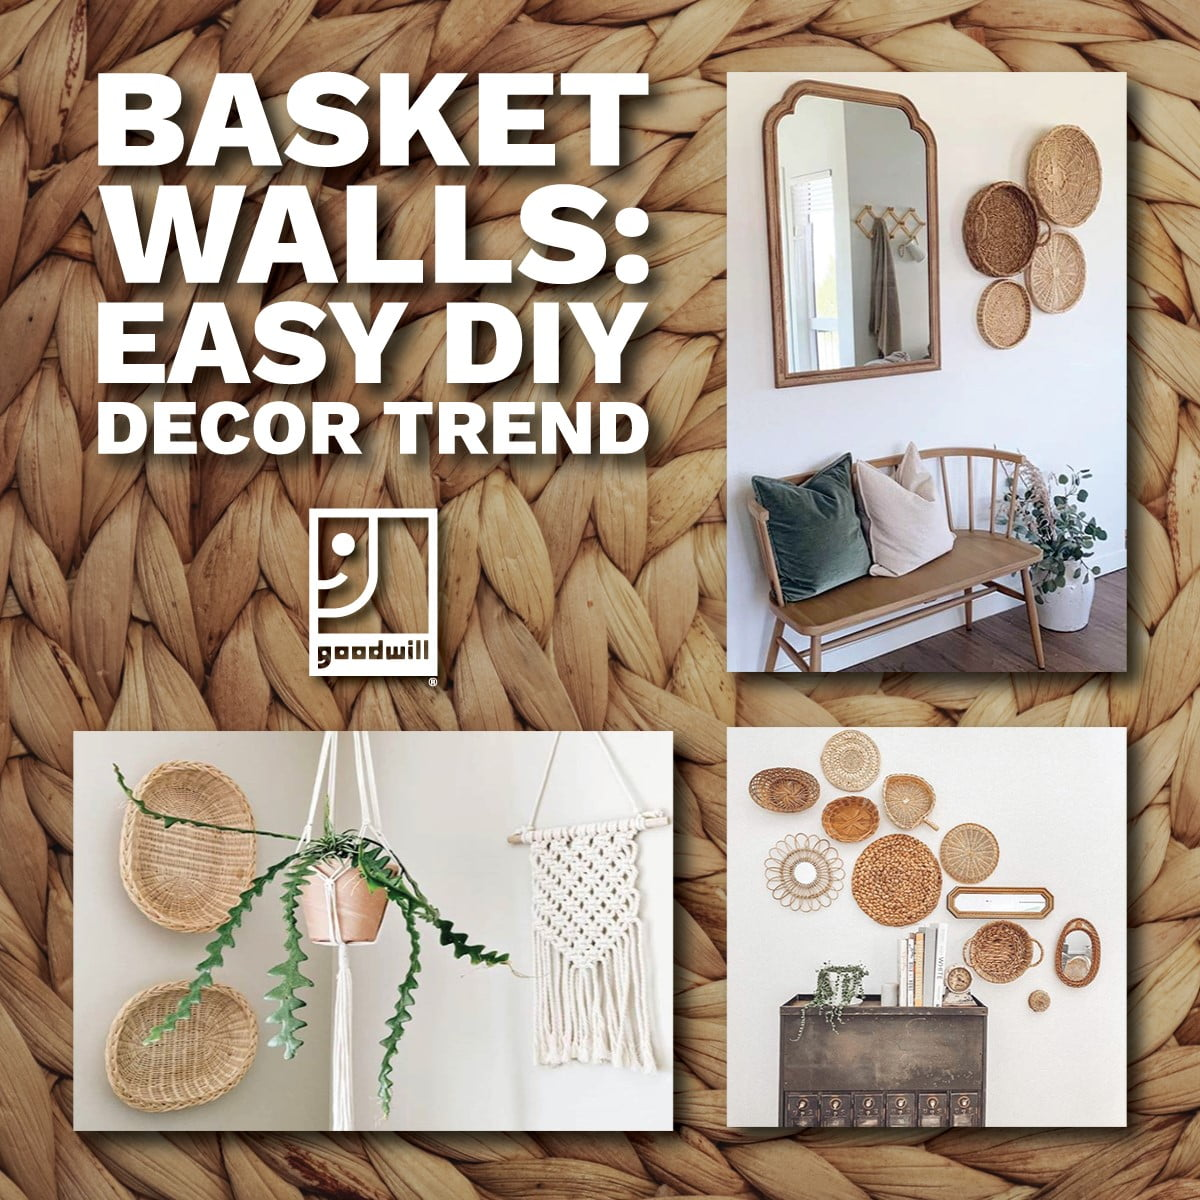 DIY basket wall decor blog post